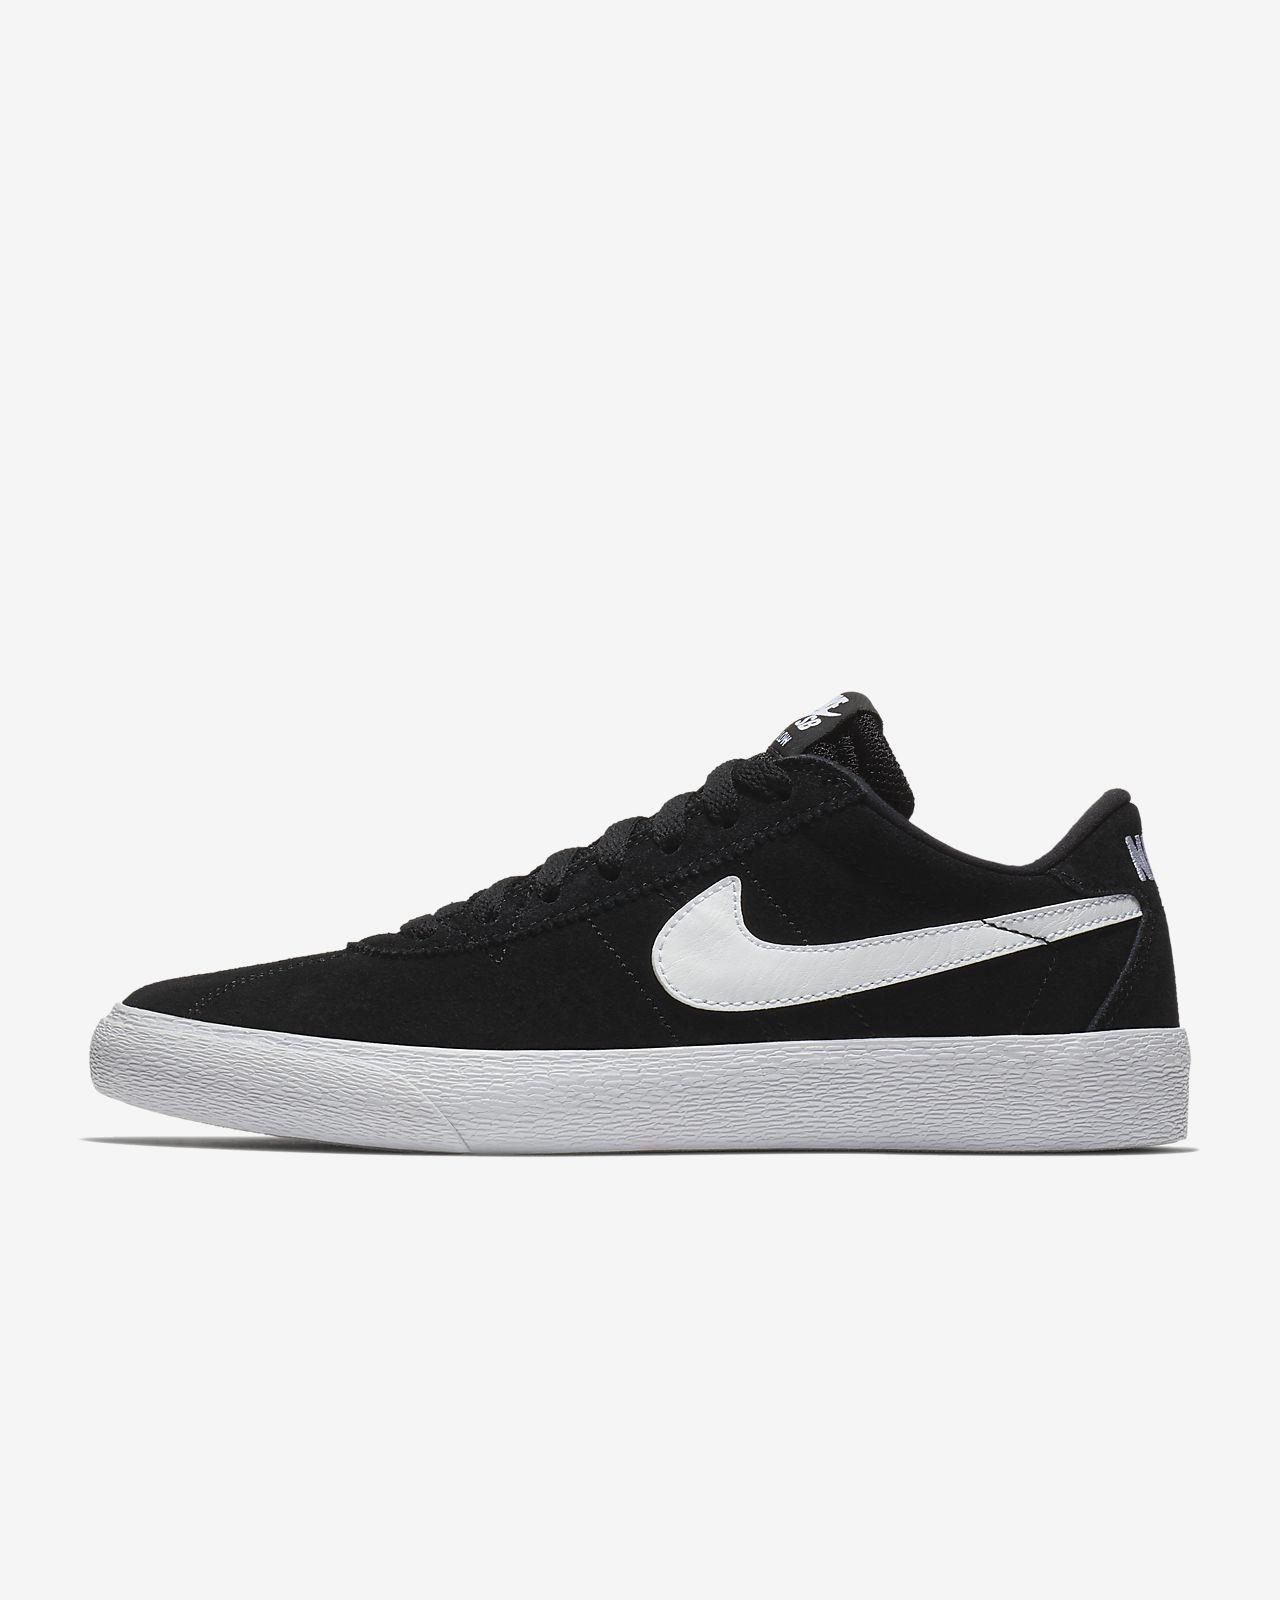 new arrival ca4ab f5f3f ... Nike SB Zoom Bruin Low Womens Skateboarding Shoe